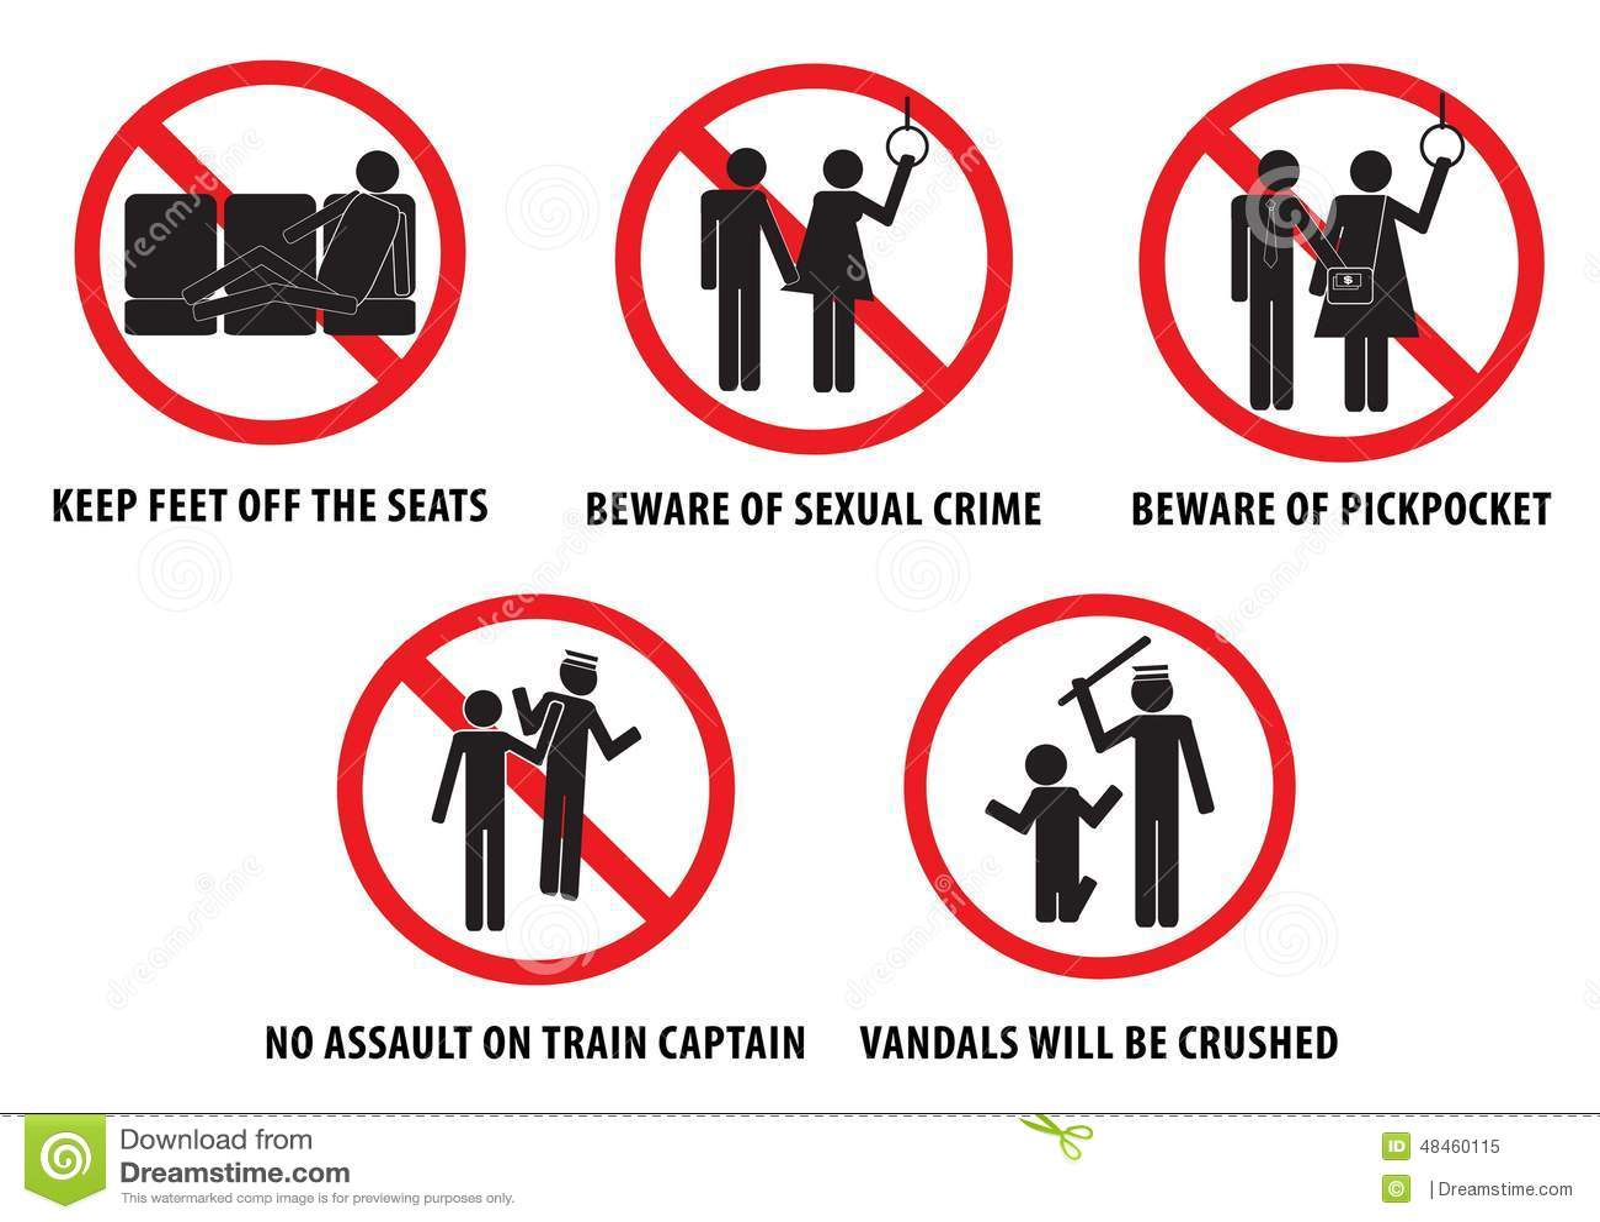 Subway train prohibit or bus prohibit signs for vandals isolated subway train prohibit or bus prohibit signs for vandals isolated easy to modify biocorpaavc Gallery